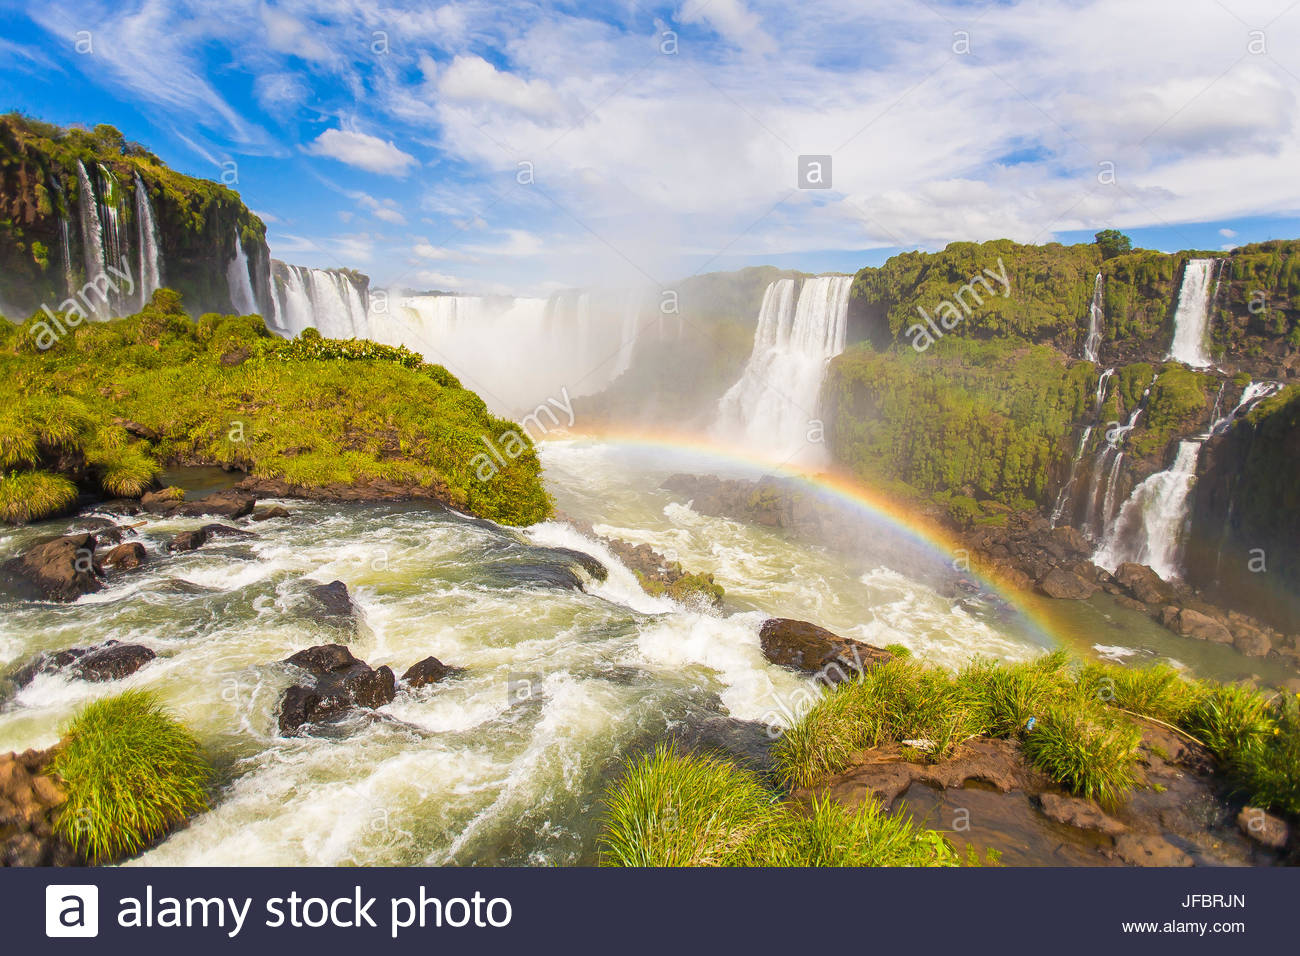 Un arcobaleno di cascate di Iguazu sul confine di Argentina e Brasile in Sud America. Immagini Stock